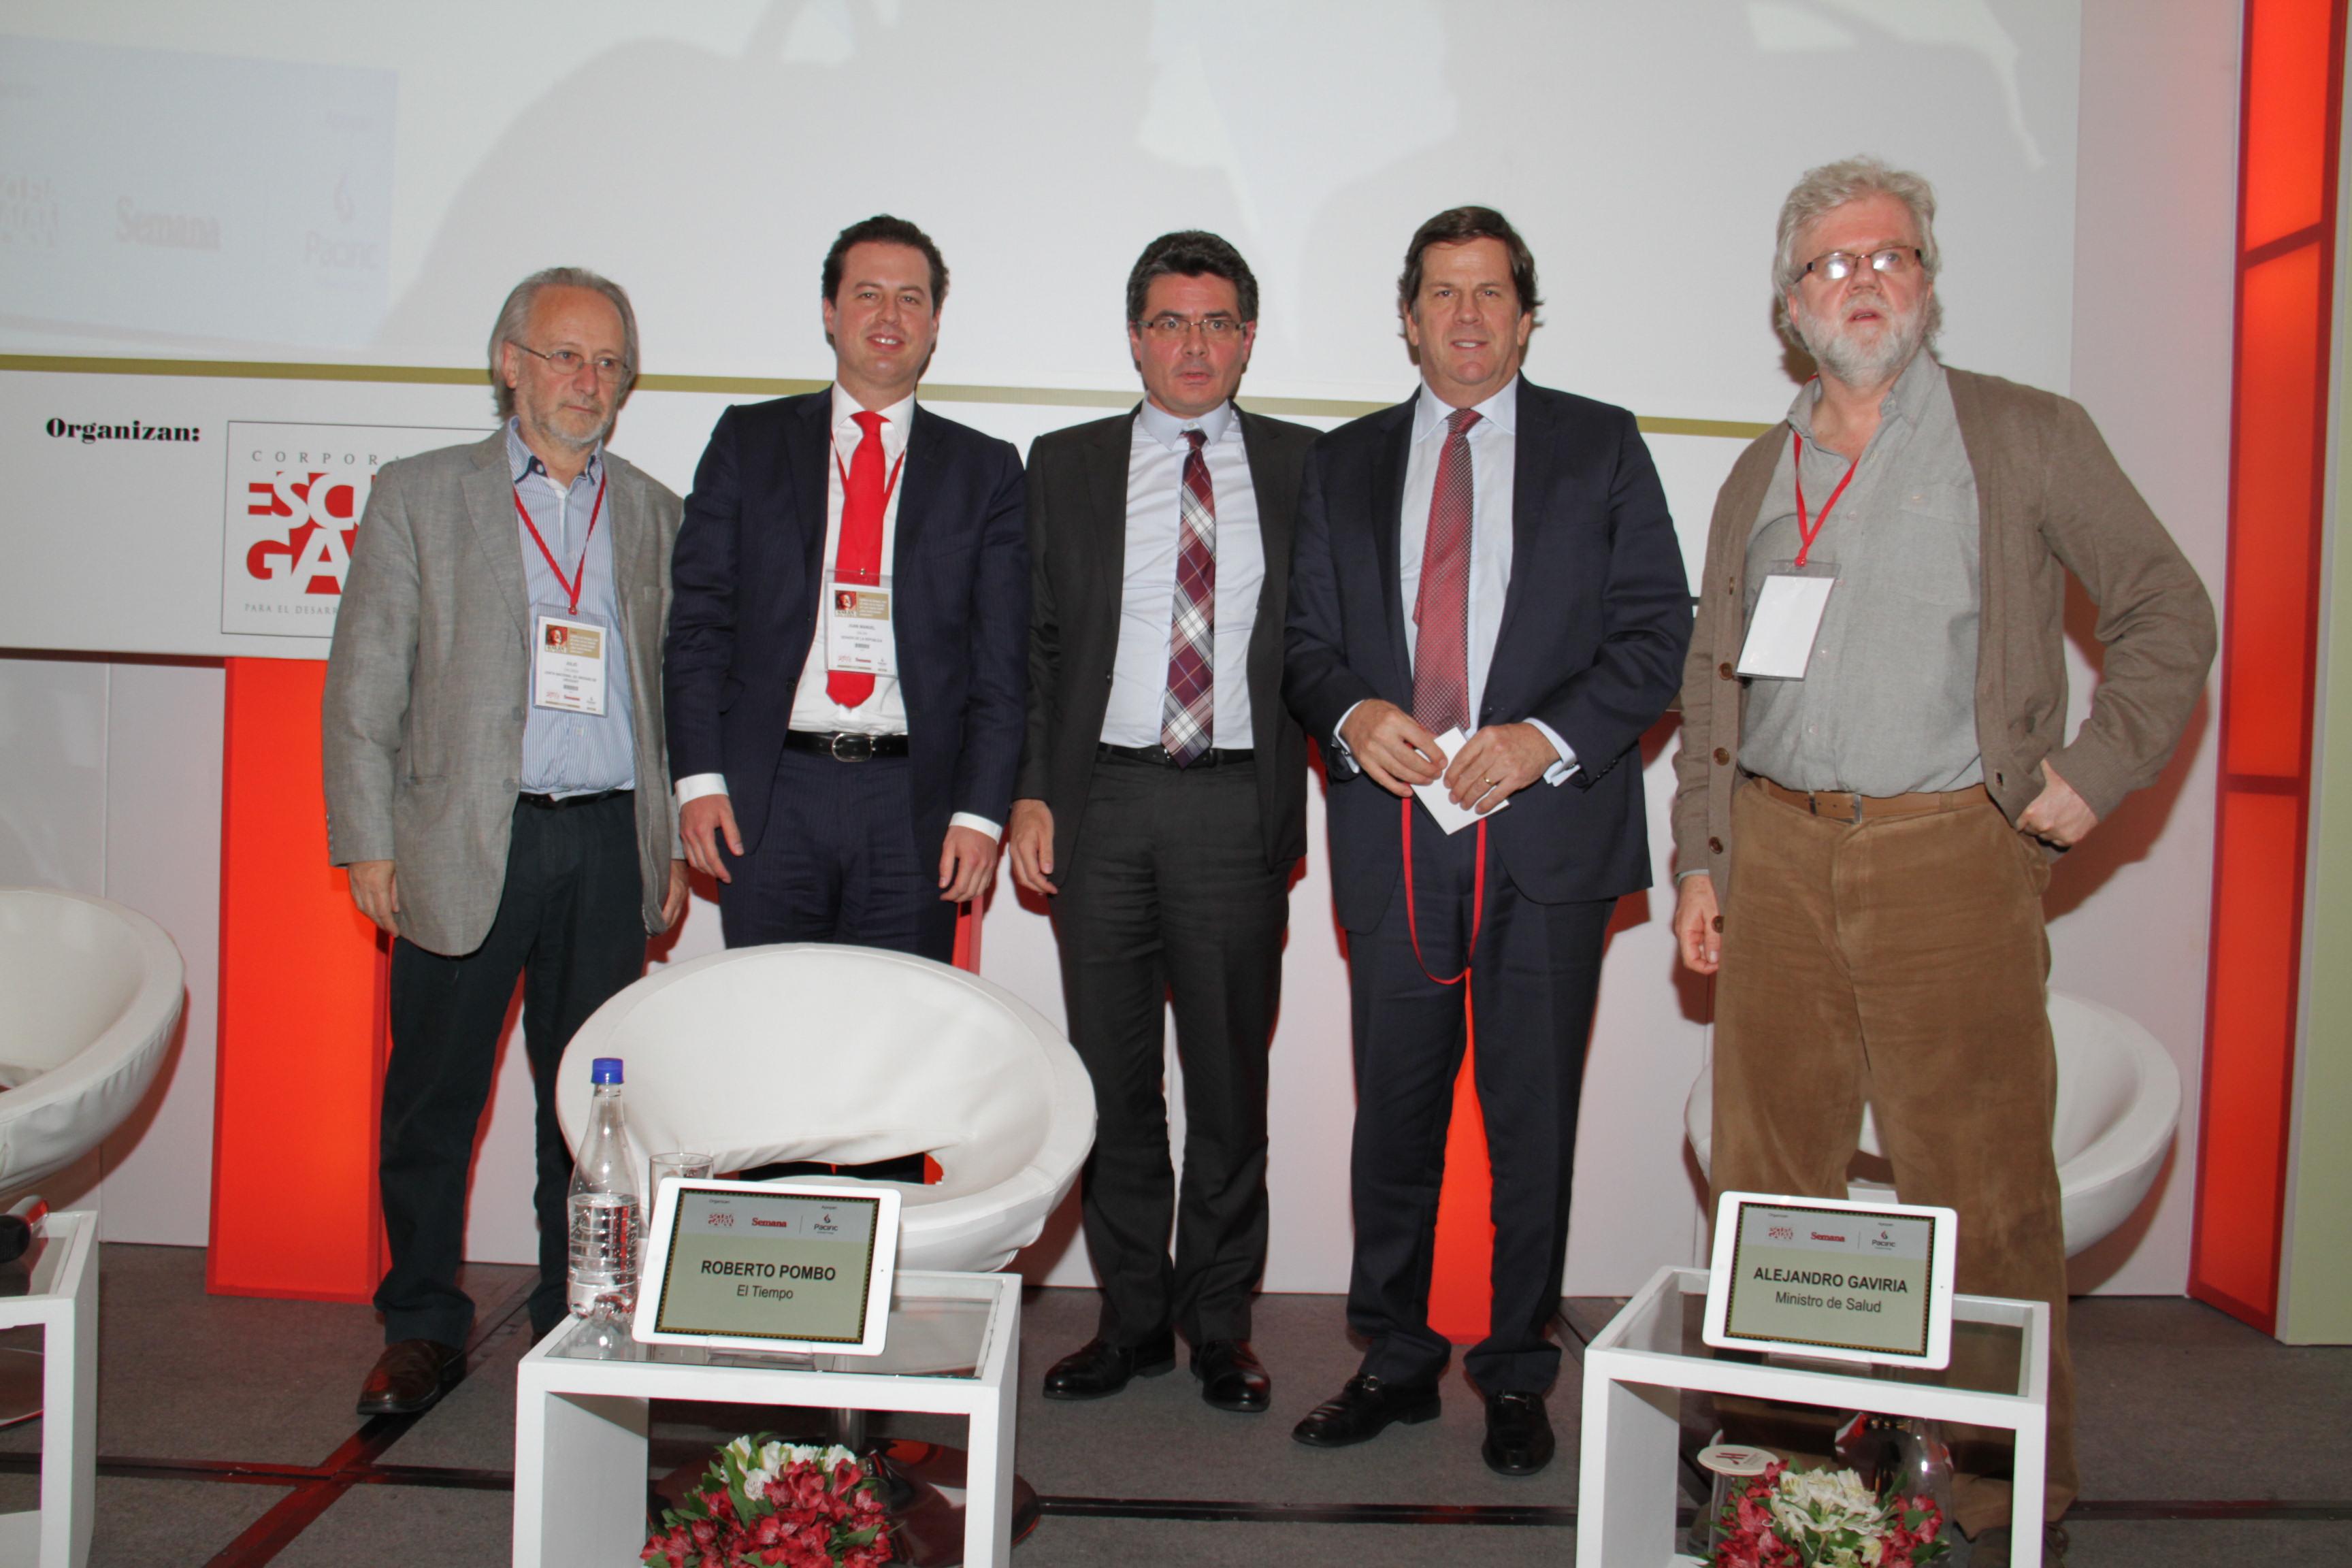 Julio Calzada, Juan Manuel Galán, Alejandro Gaviria, Roberto Pombo  y Rodrigo Uprimny